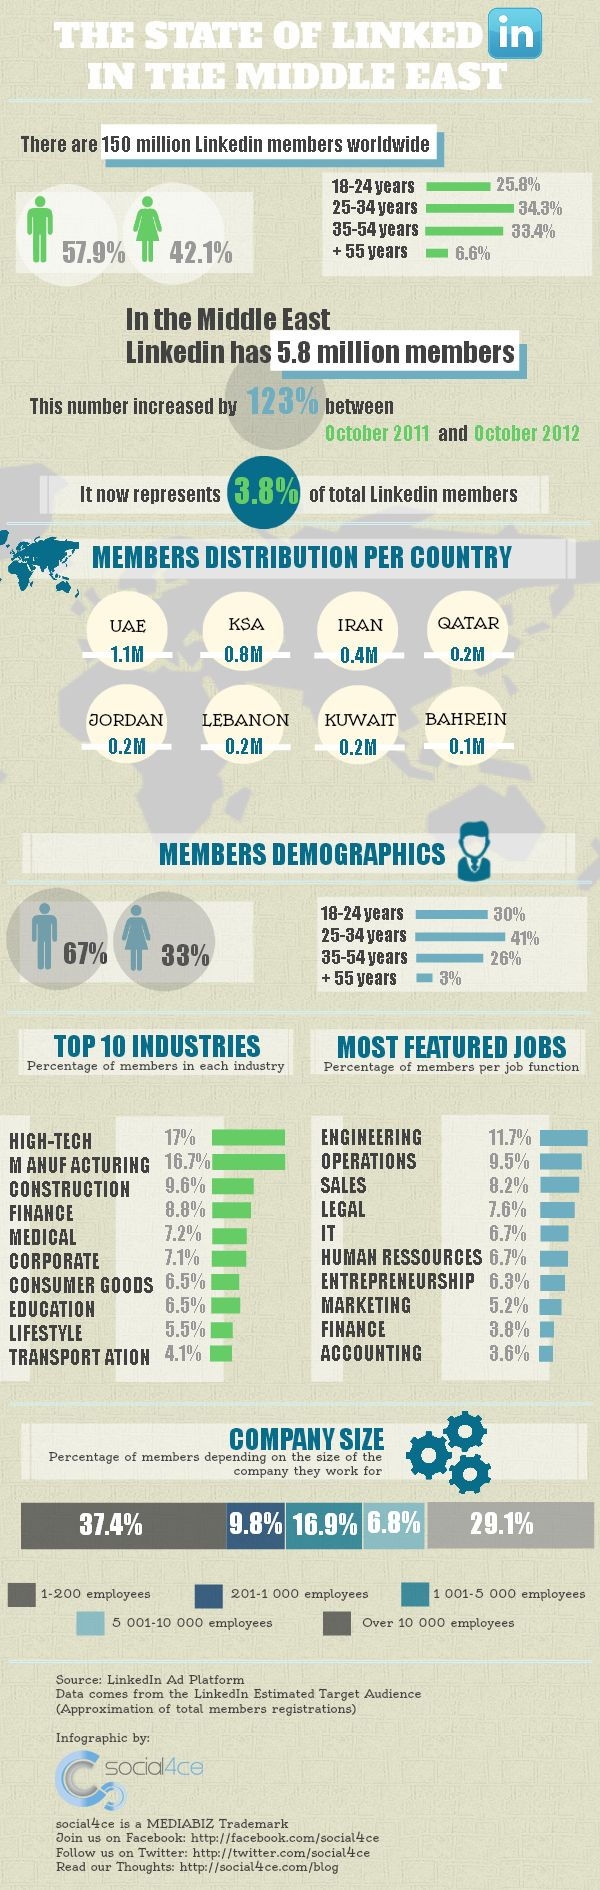 The state of LinkedIn in the Middle East  - the UAE and Saudi Arabia lead in numbers of LinkedIn members (Wamda / Social4ce)